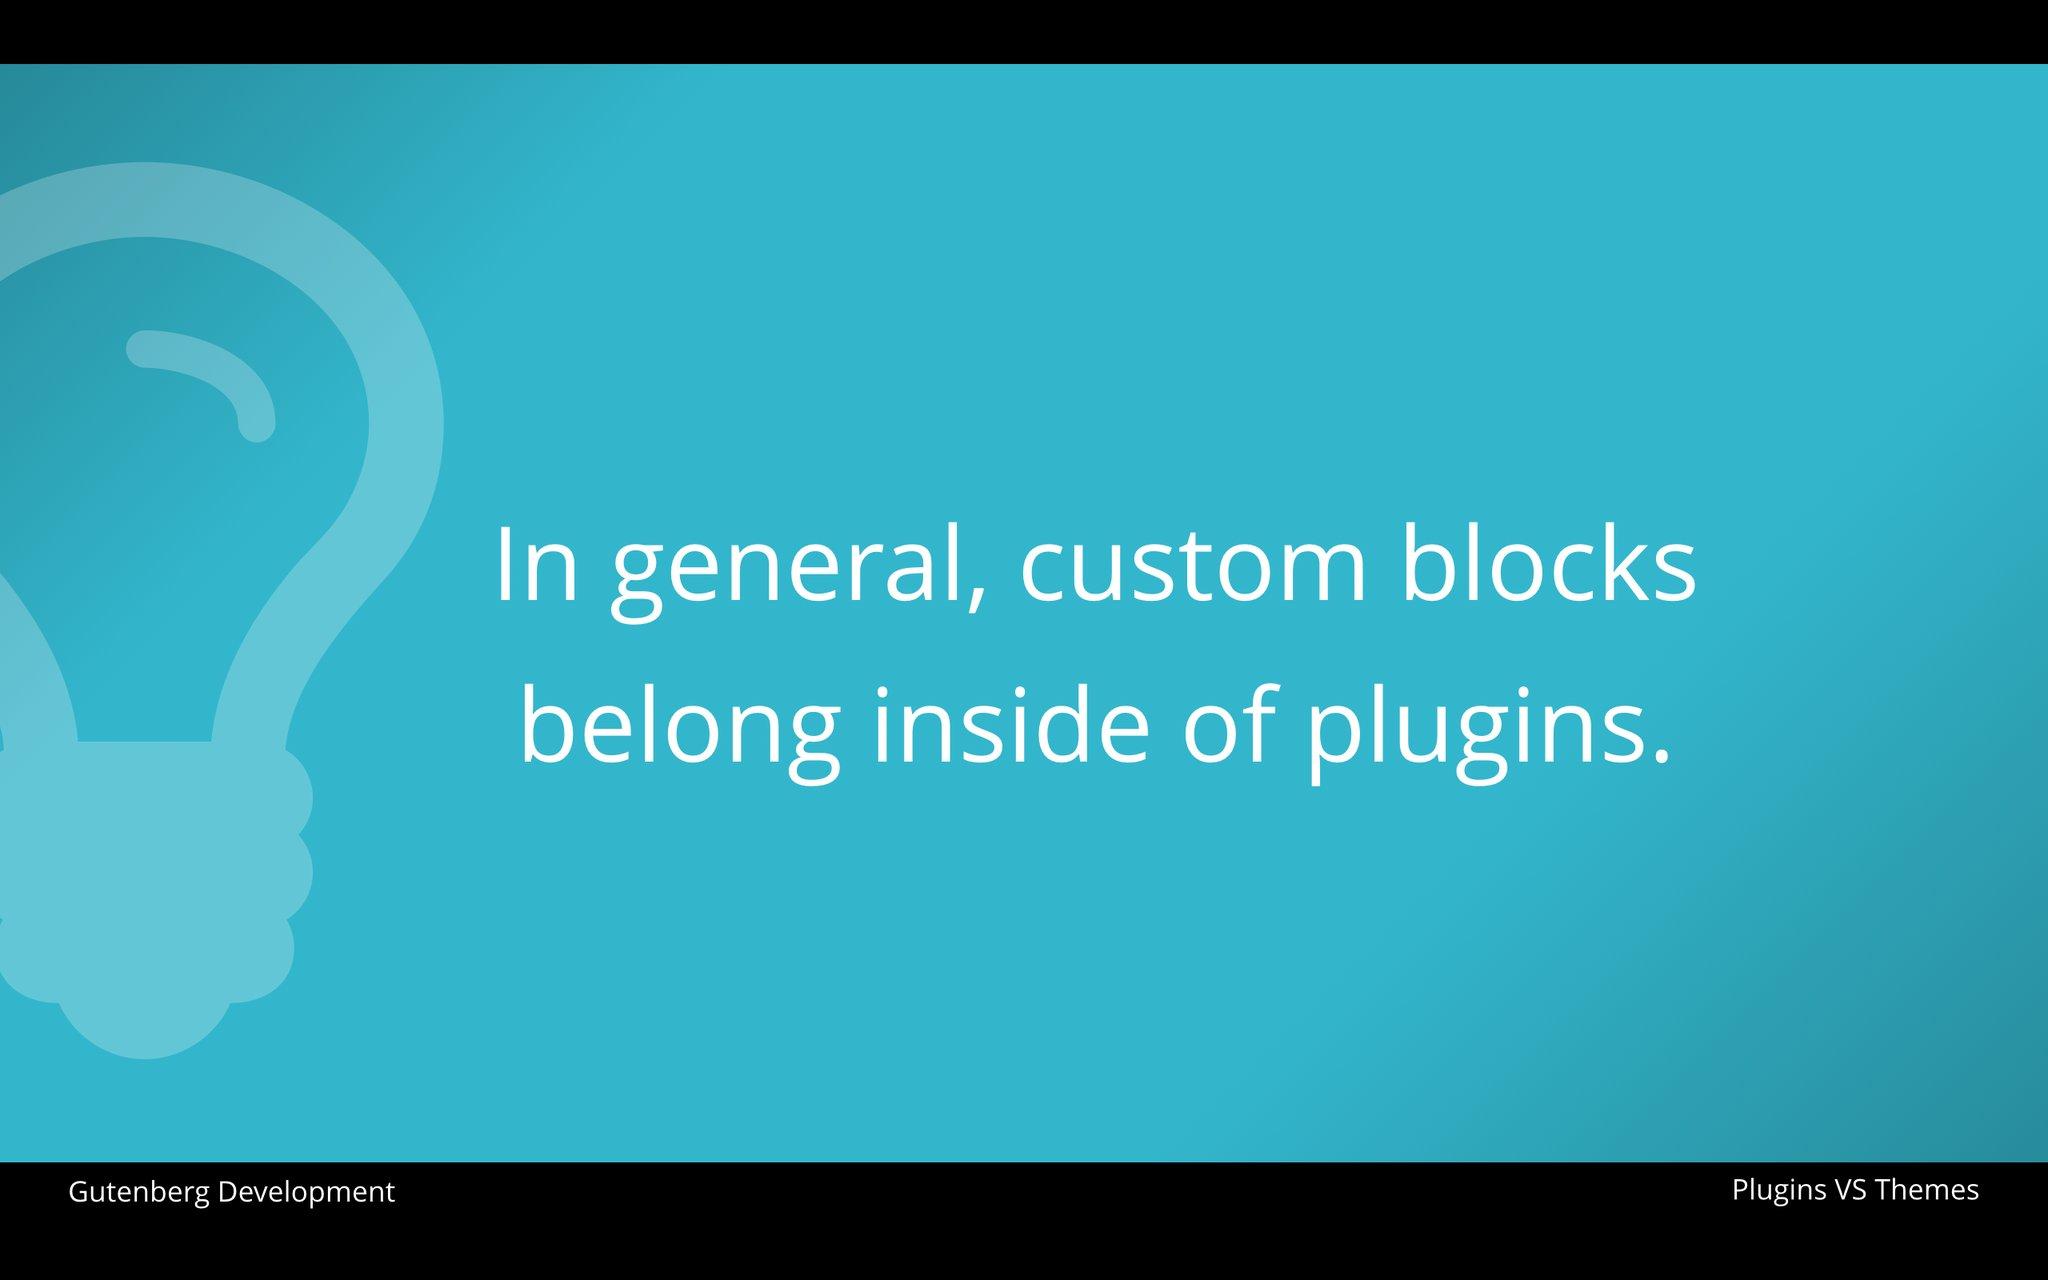 Text on Image: In general, custom blocks belong inside of plugins. Zac Gordon